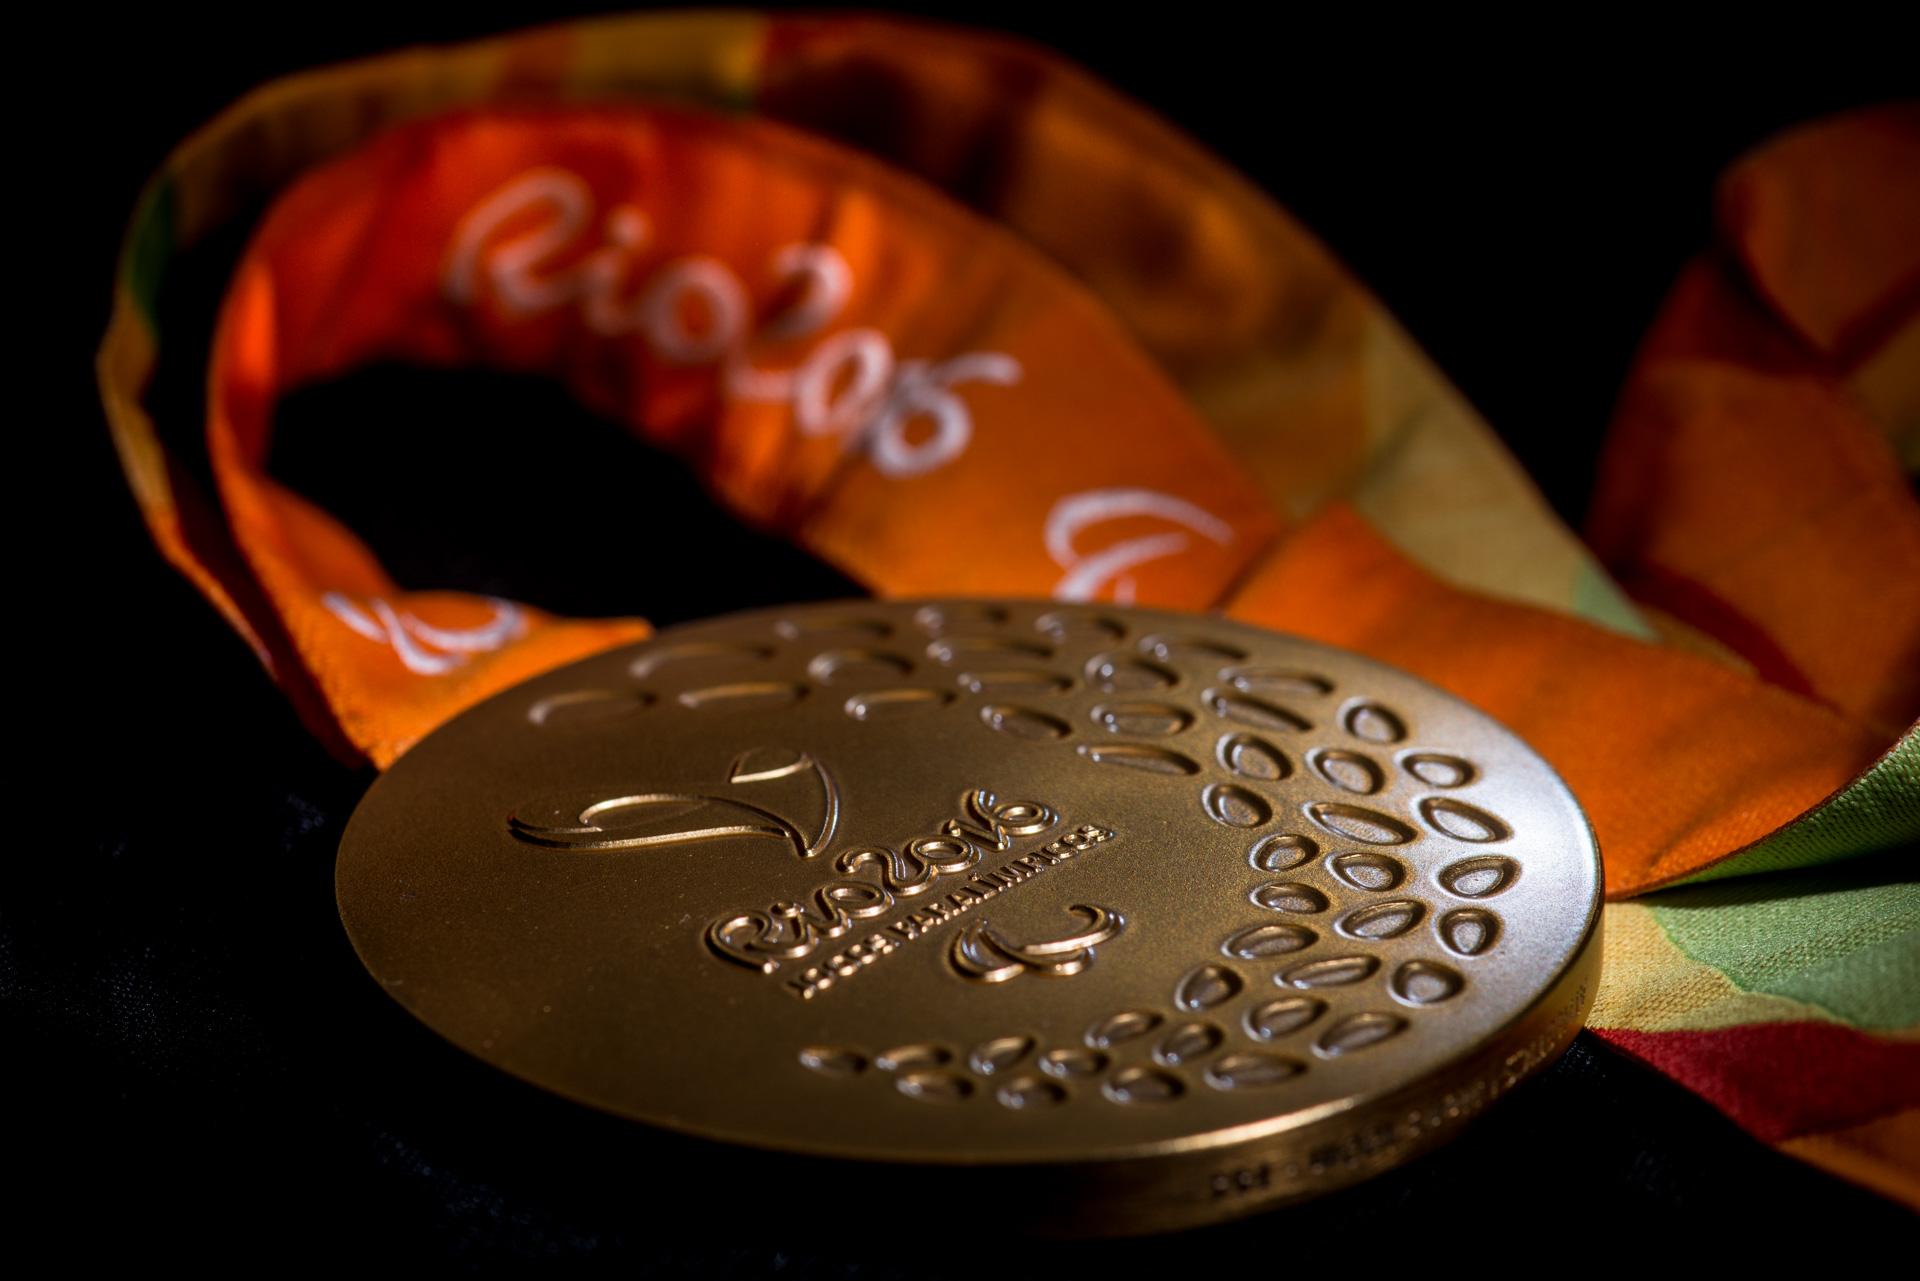 08/06/2016. Medalhas. Estúdio.